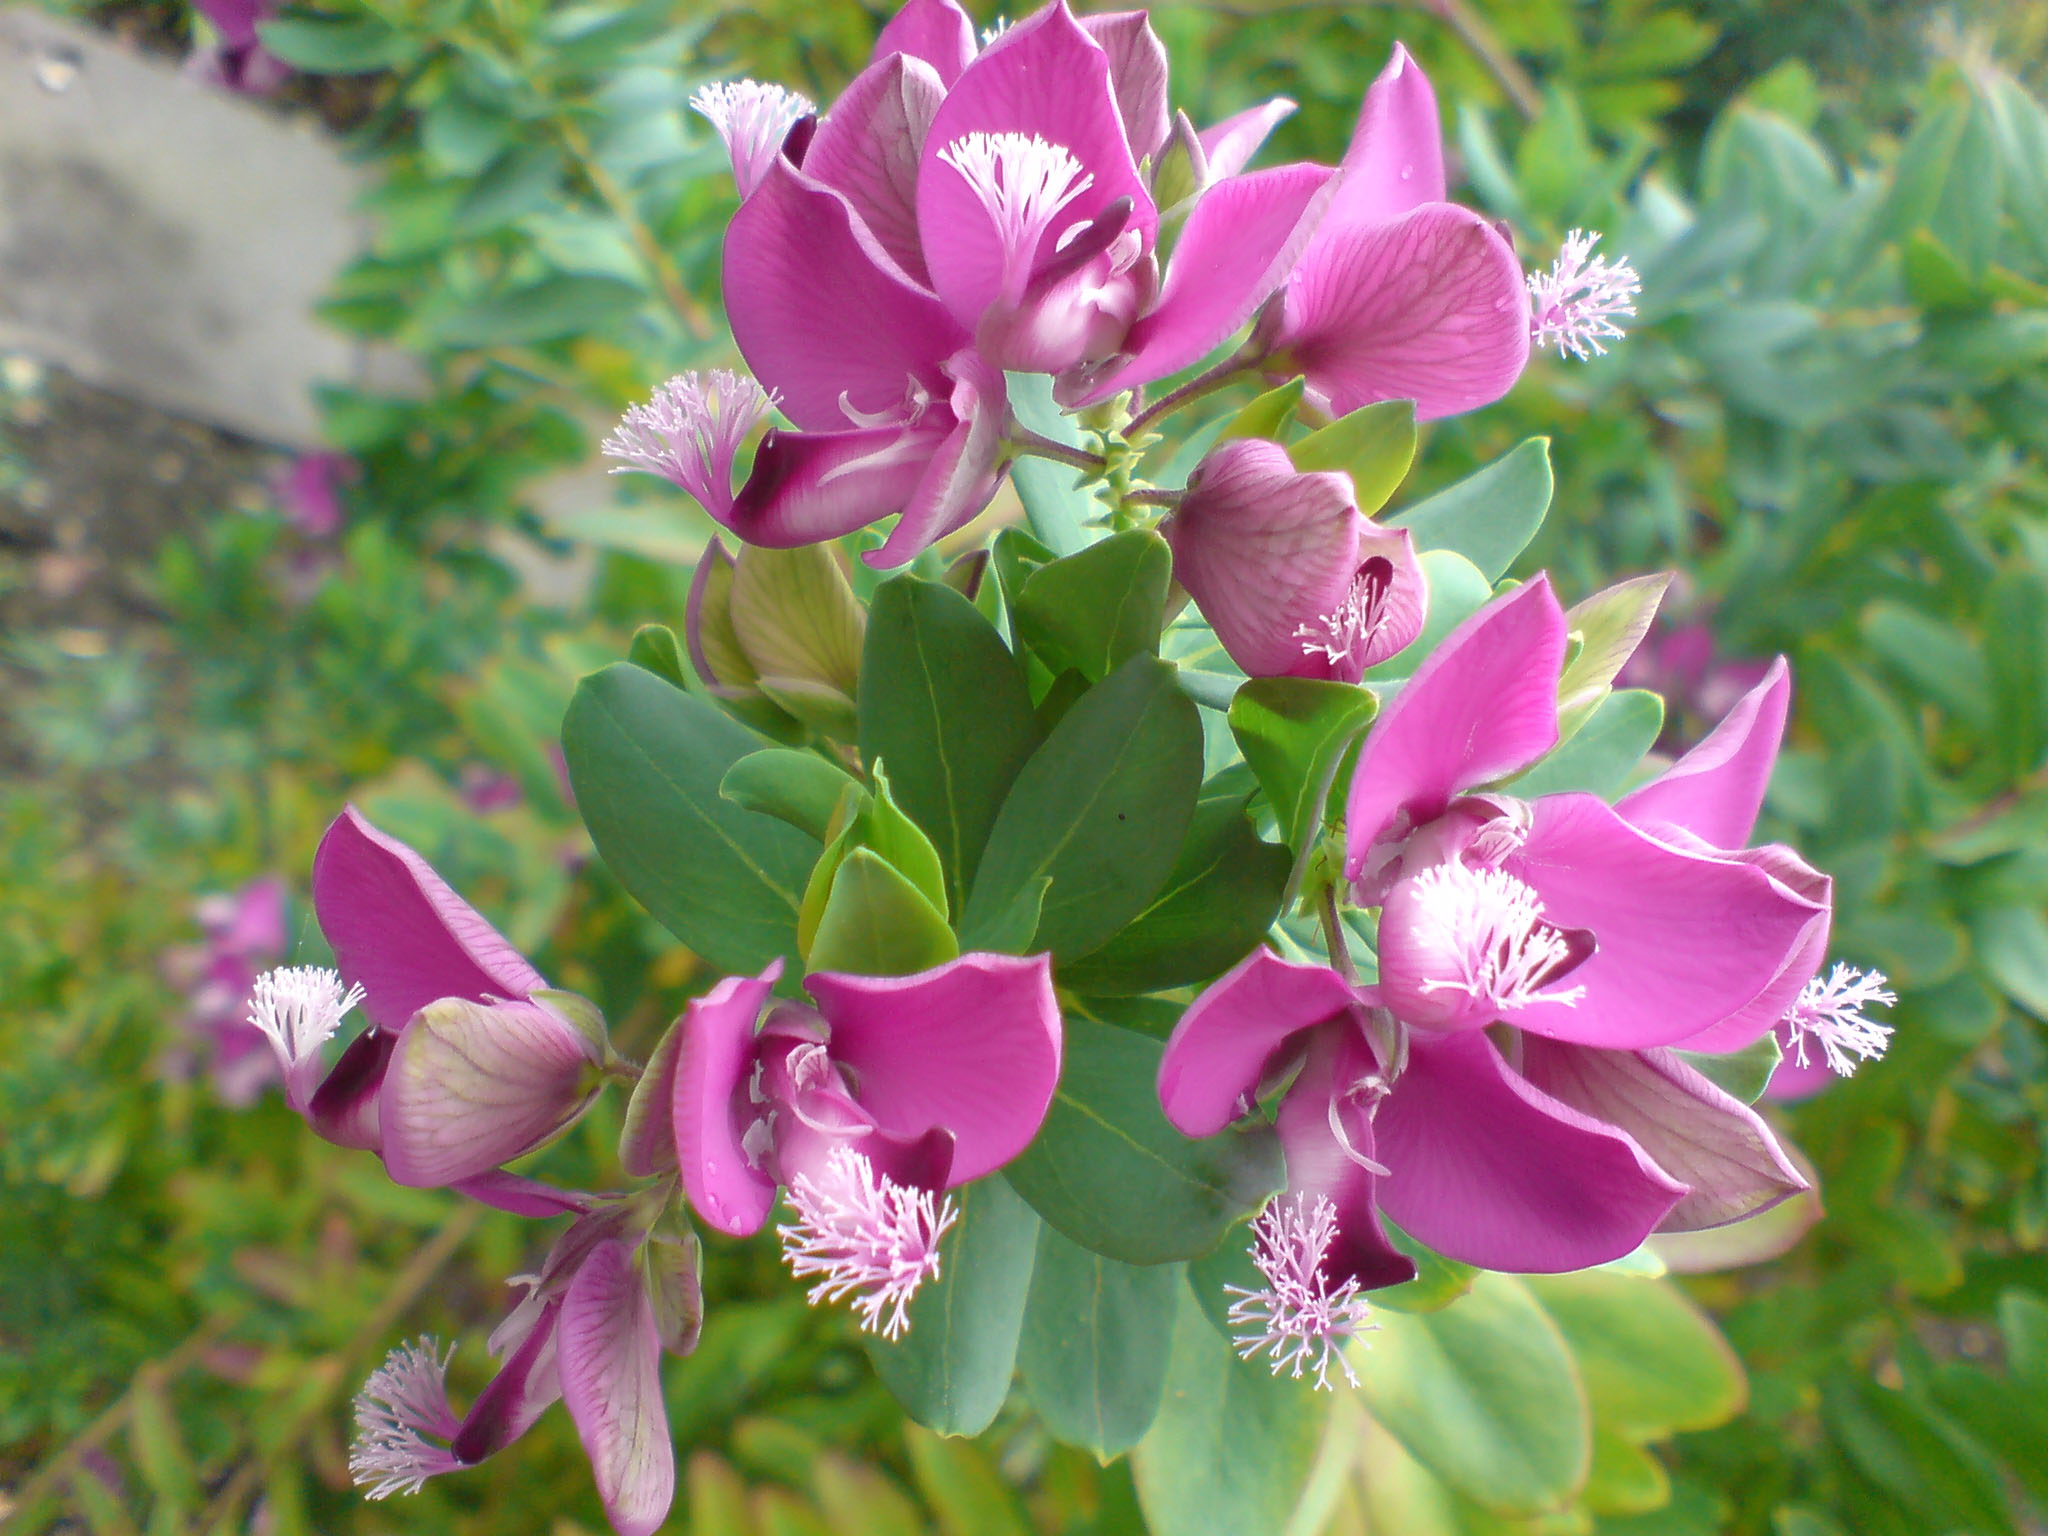 File:Polygala myrtifolia (var. grandiflora)-1.JPG